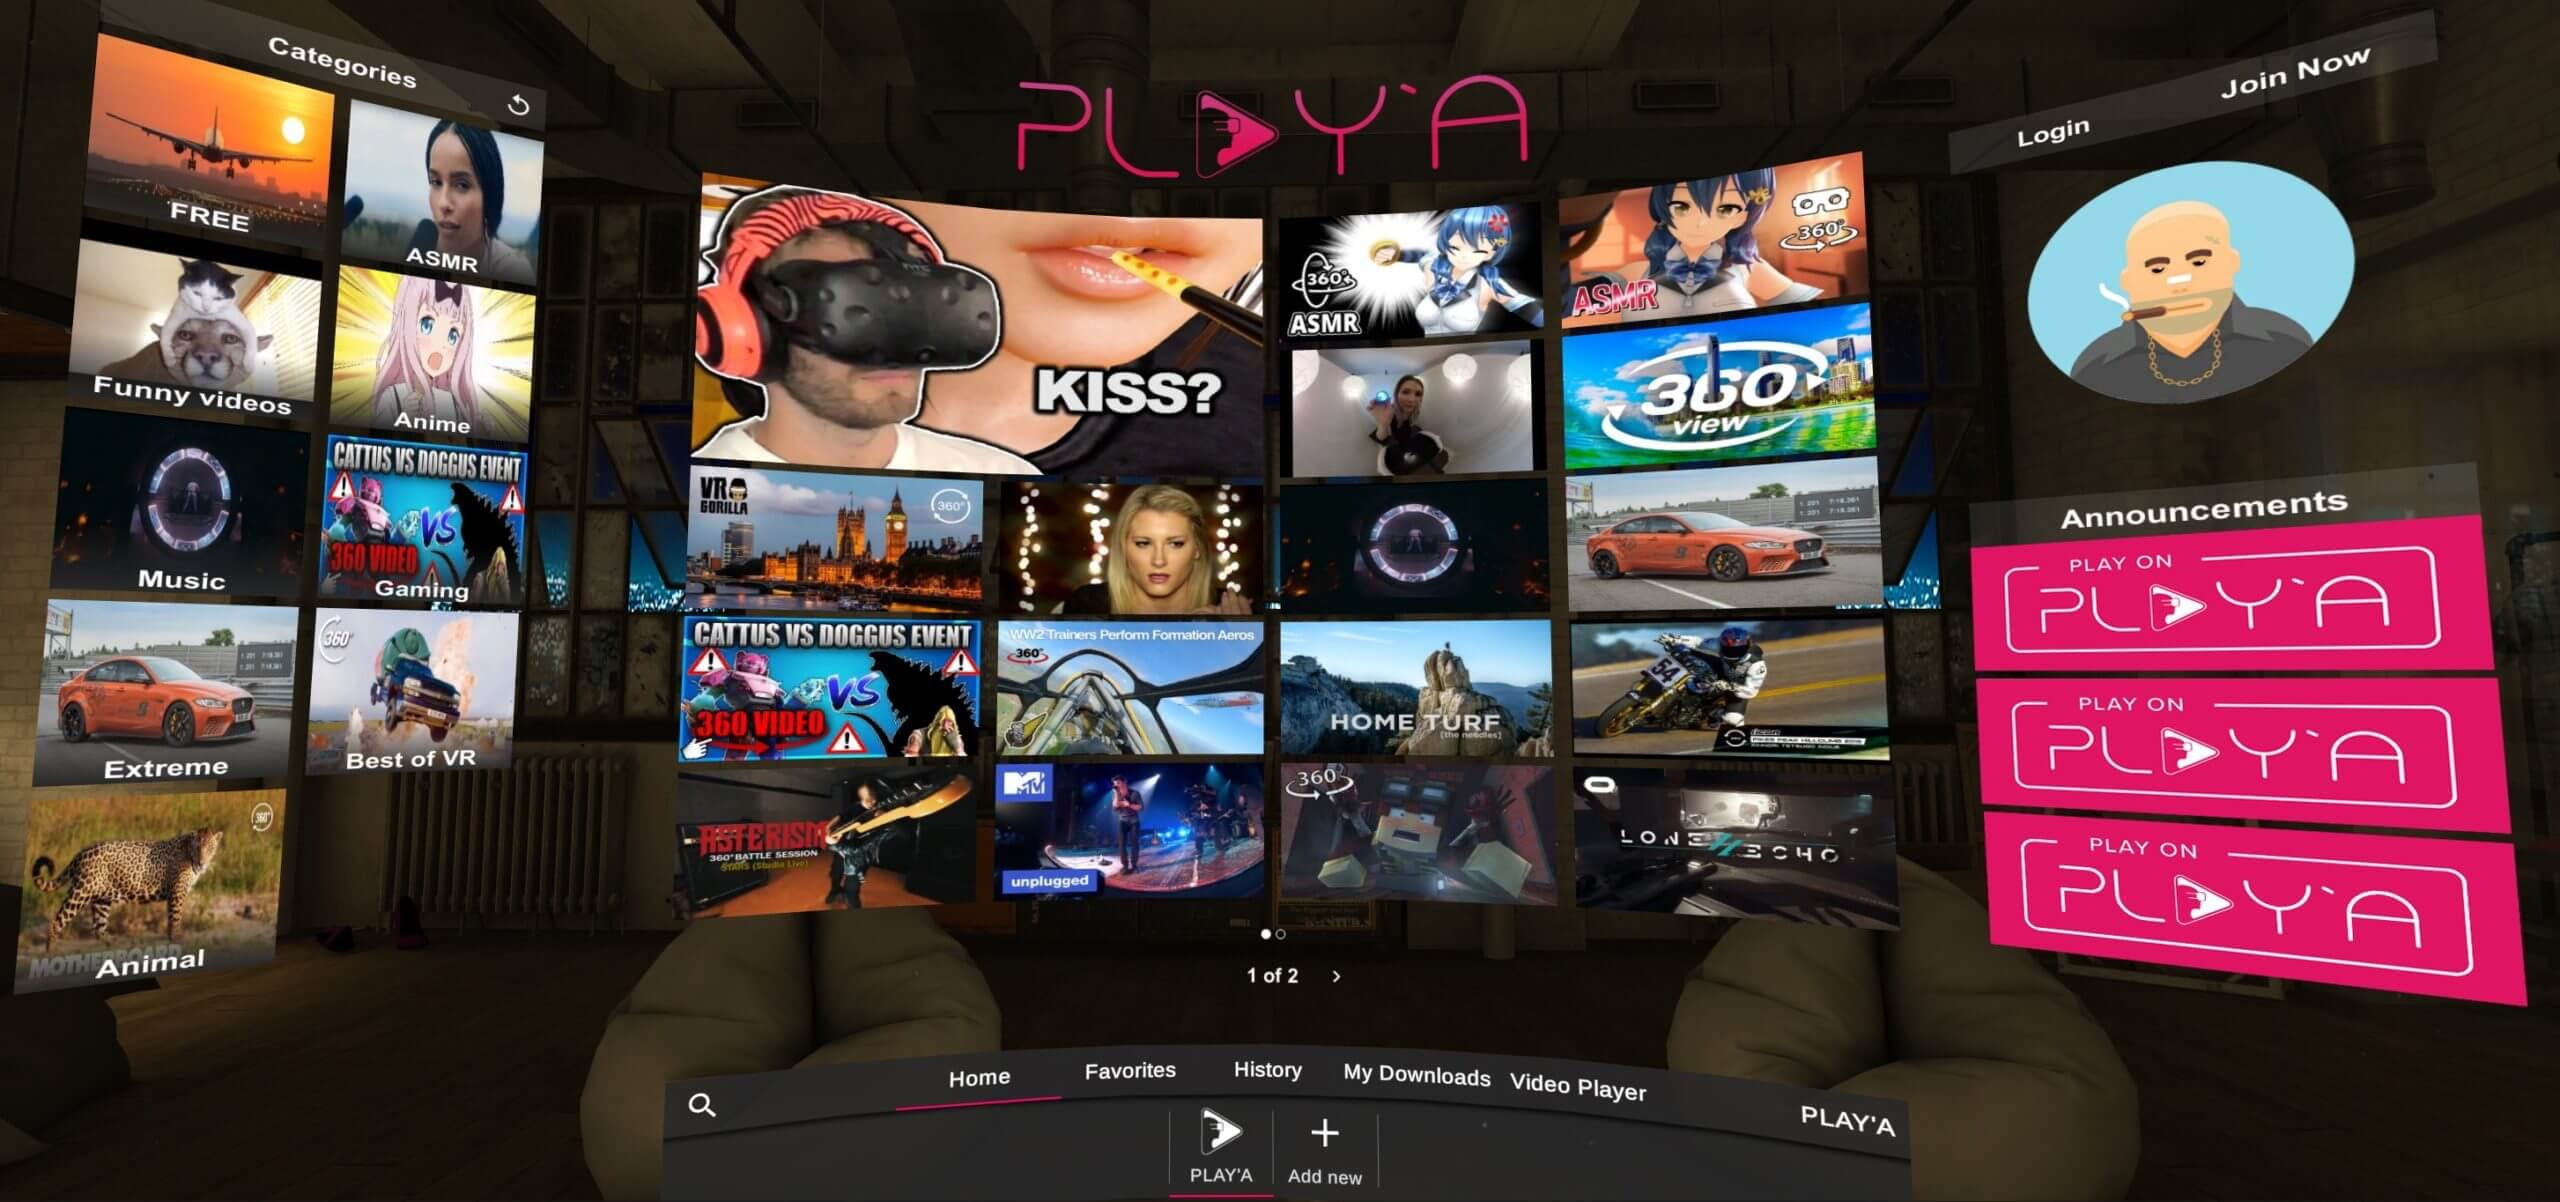 Oculus Quest Porn Apps Playa VR